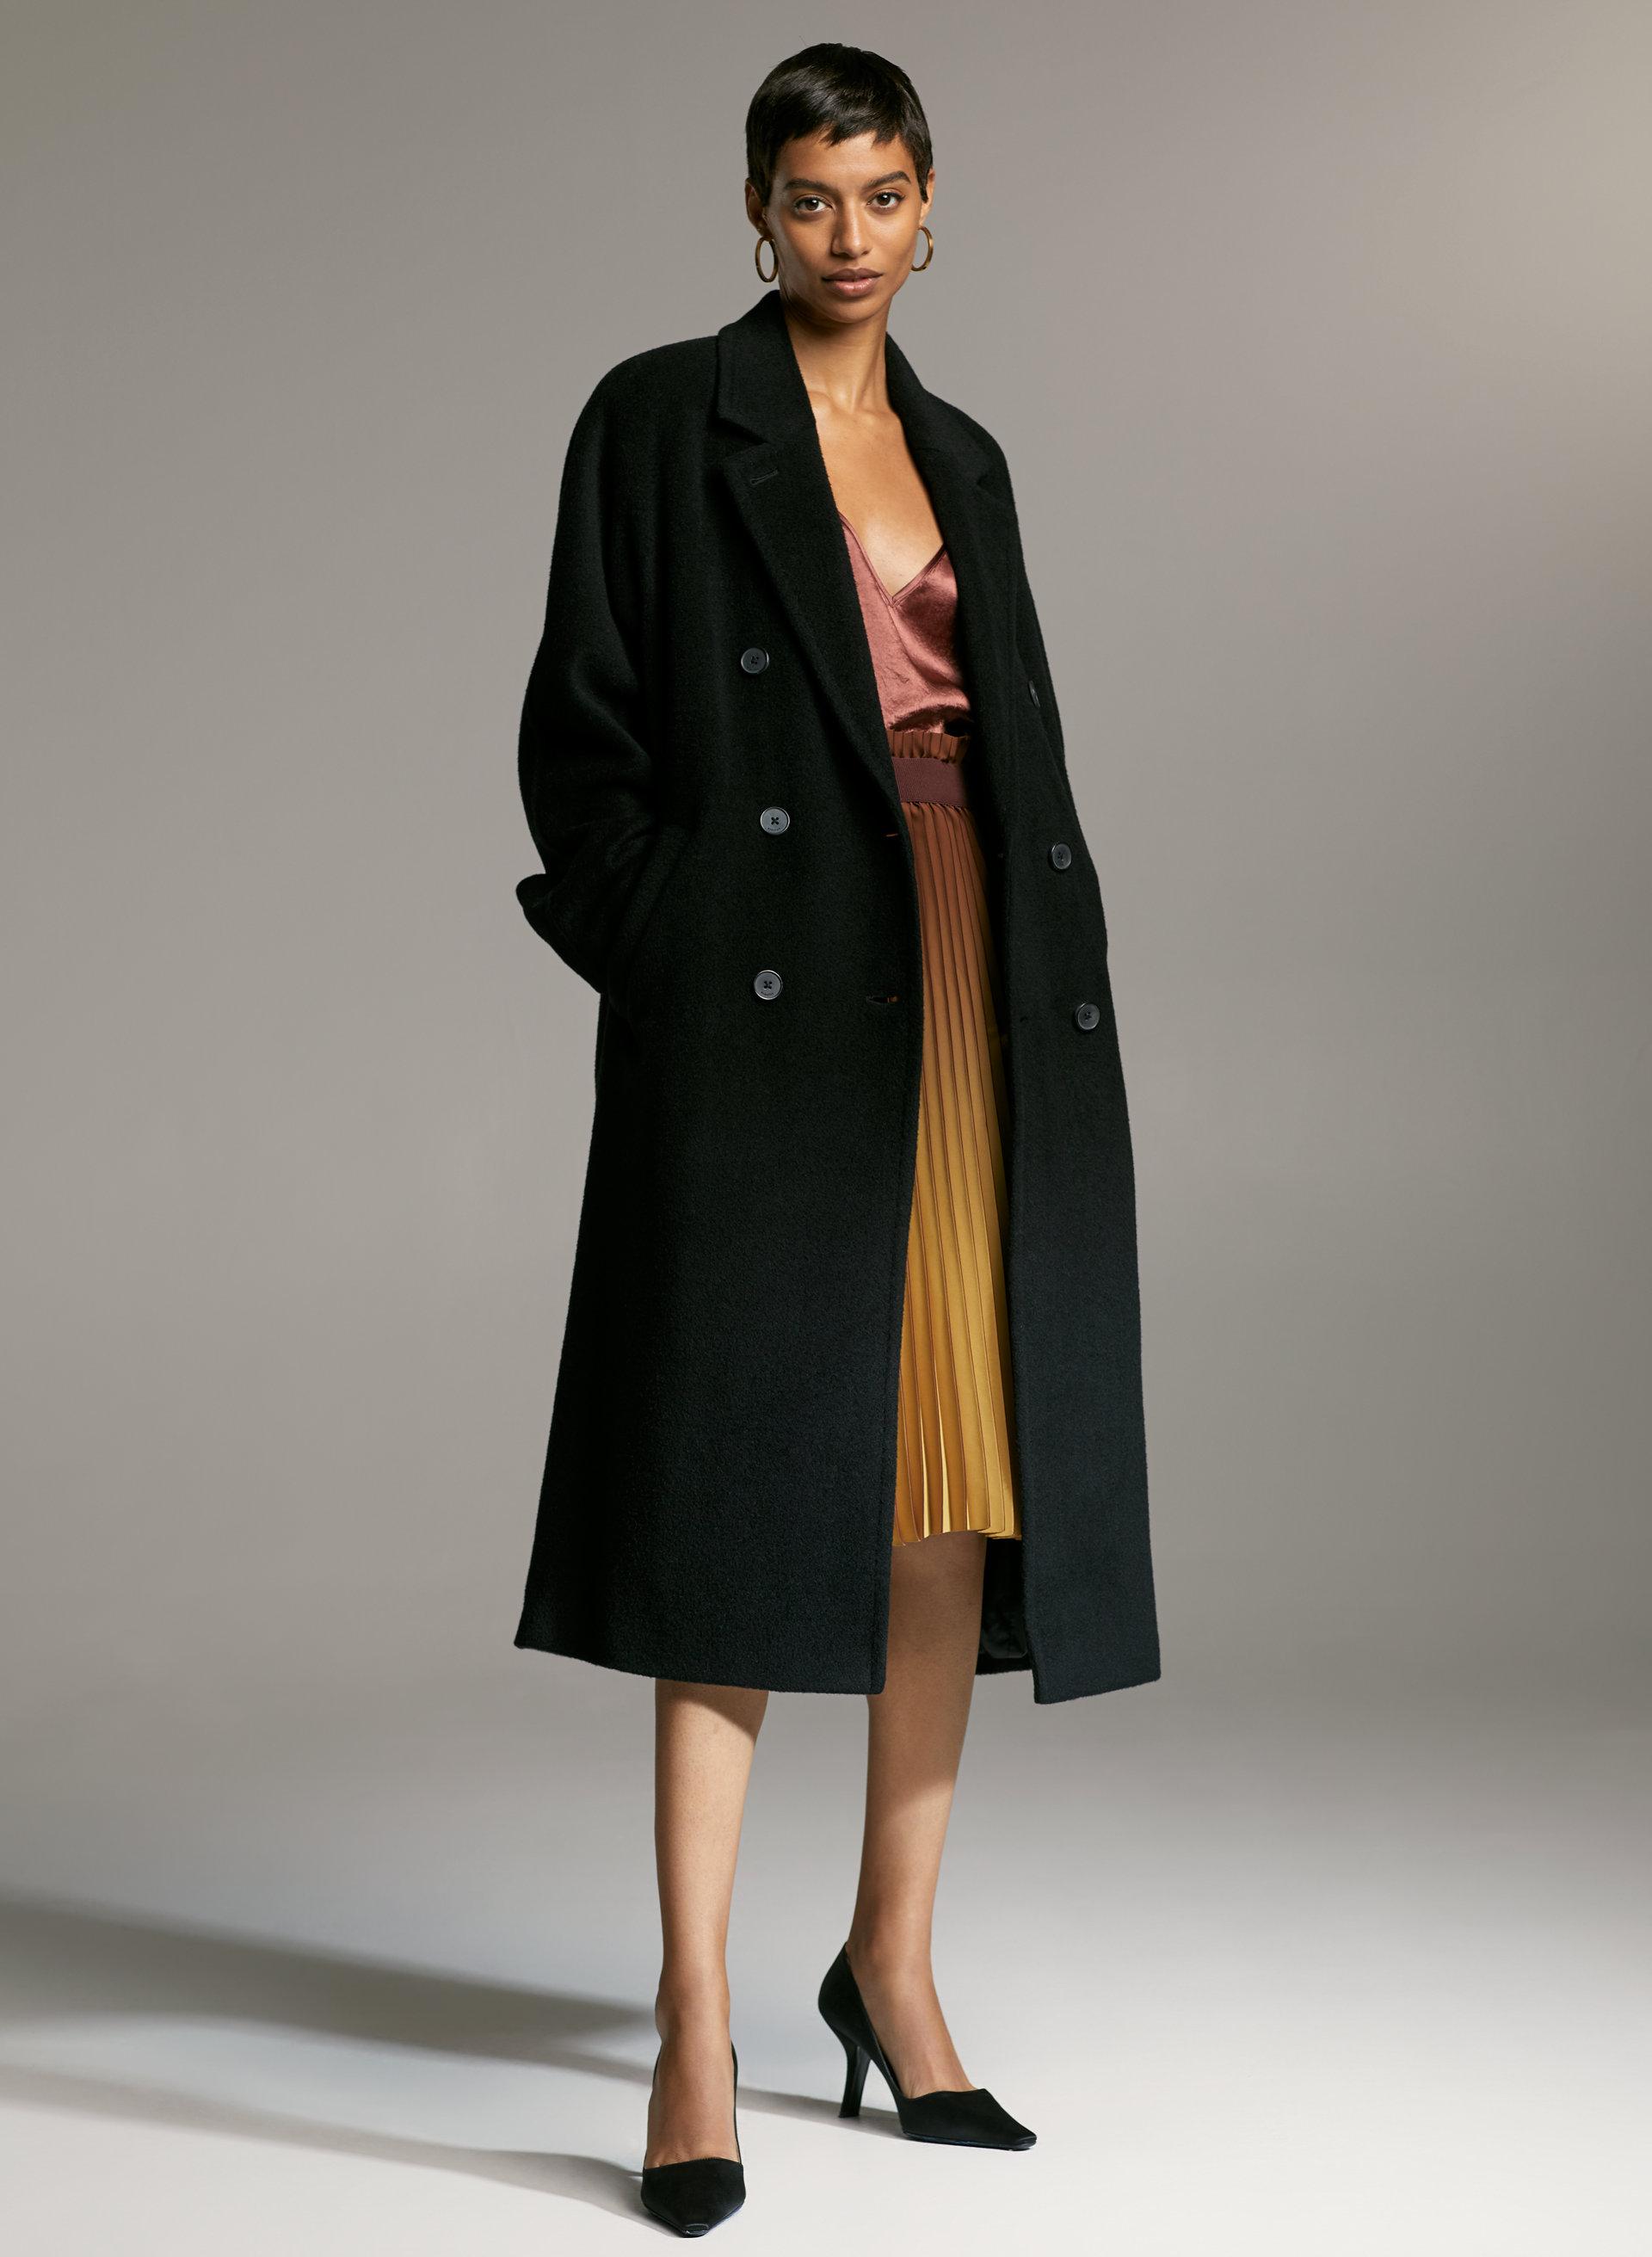 Wool camel coat women Trench Camel coat black friday sale autumn coat autumn wool coat sale camel coat sale coats on sale